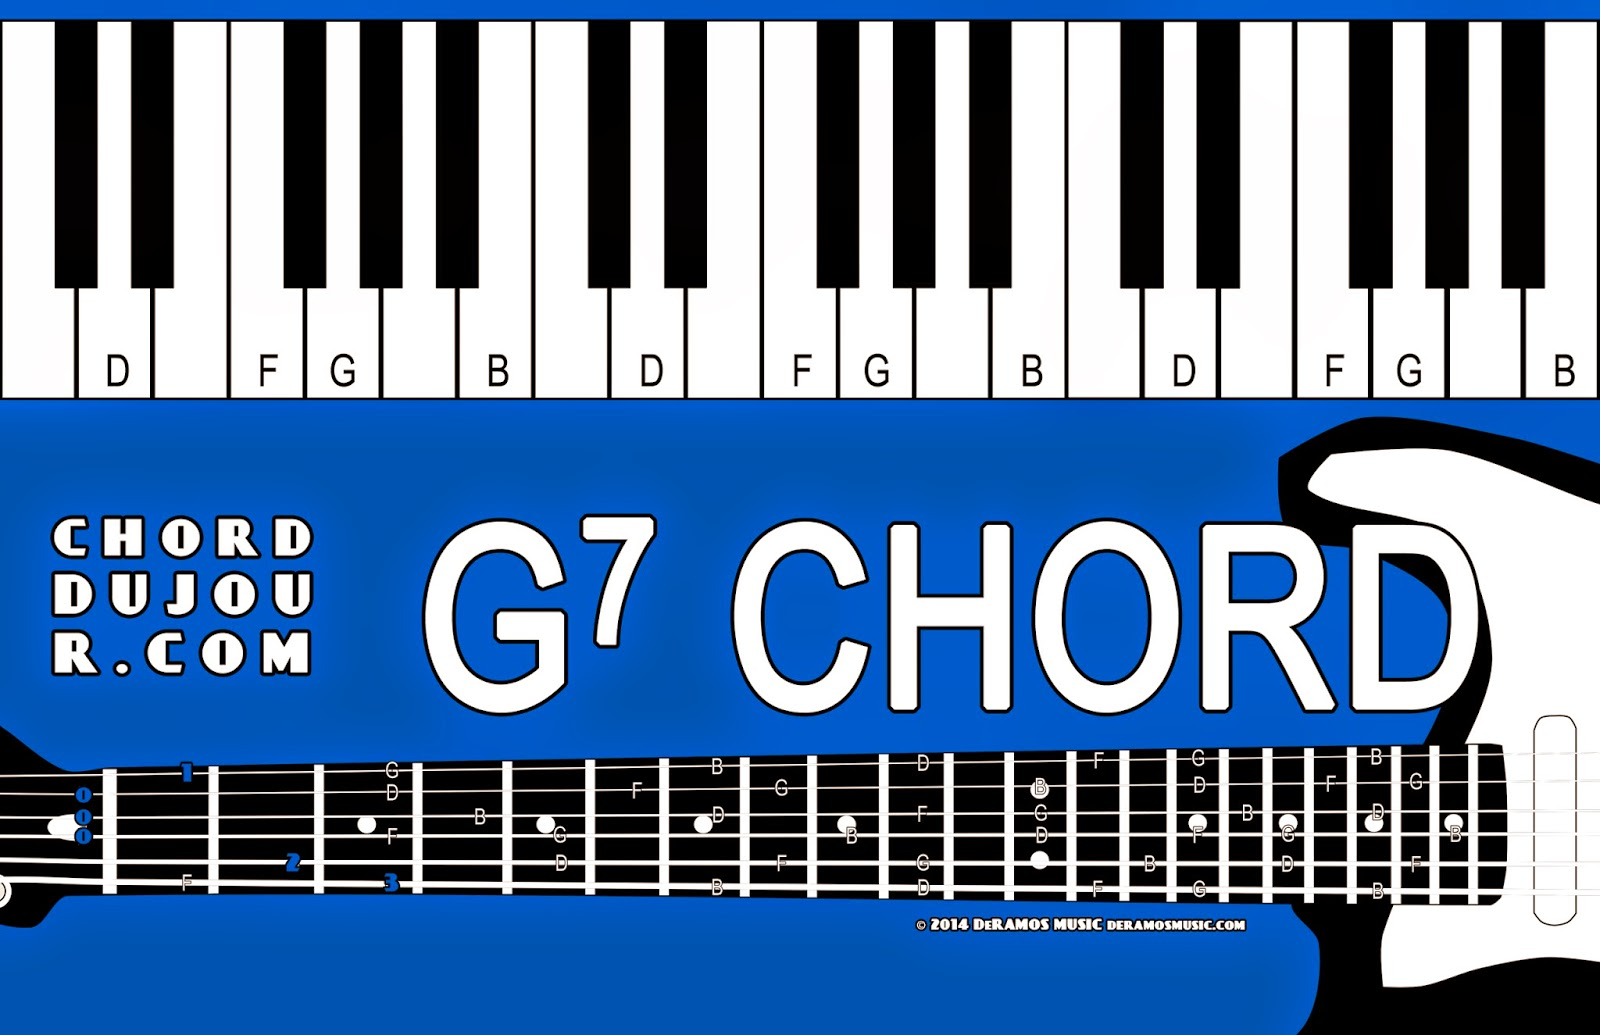 Chord Du Jour Chord Deux Jour Challenge G7 And Bm7b5